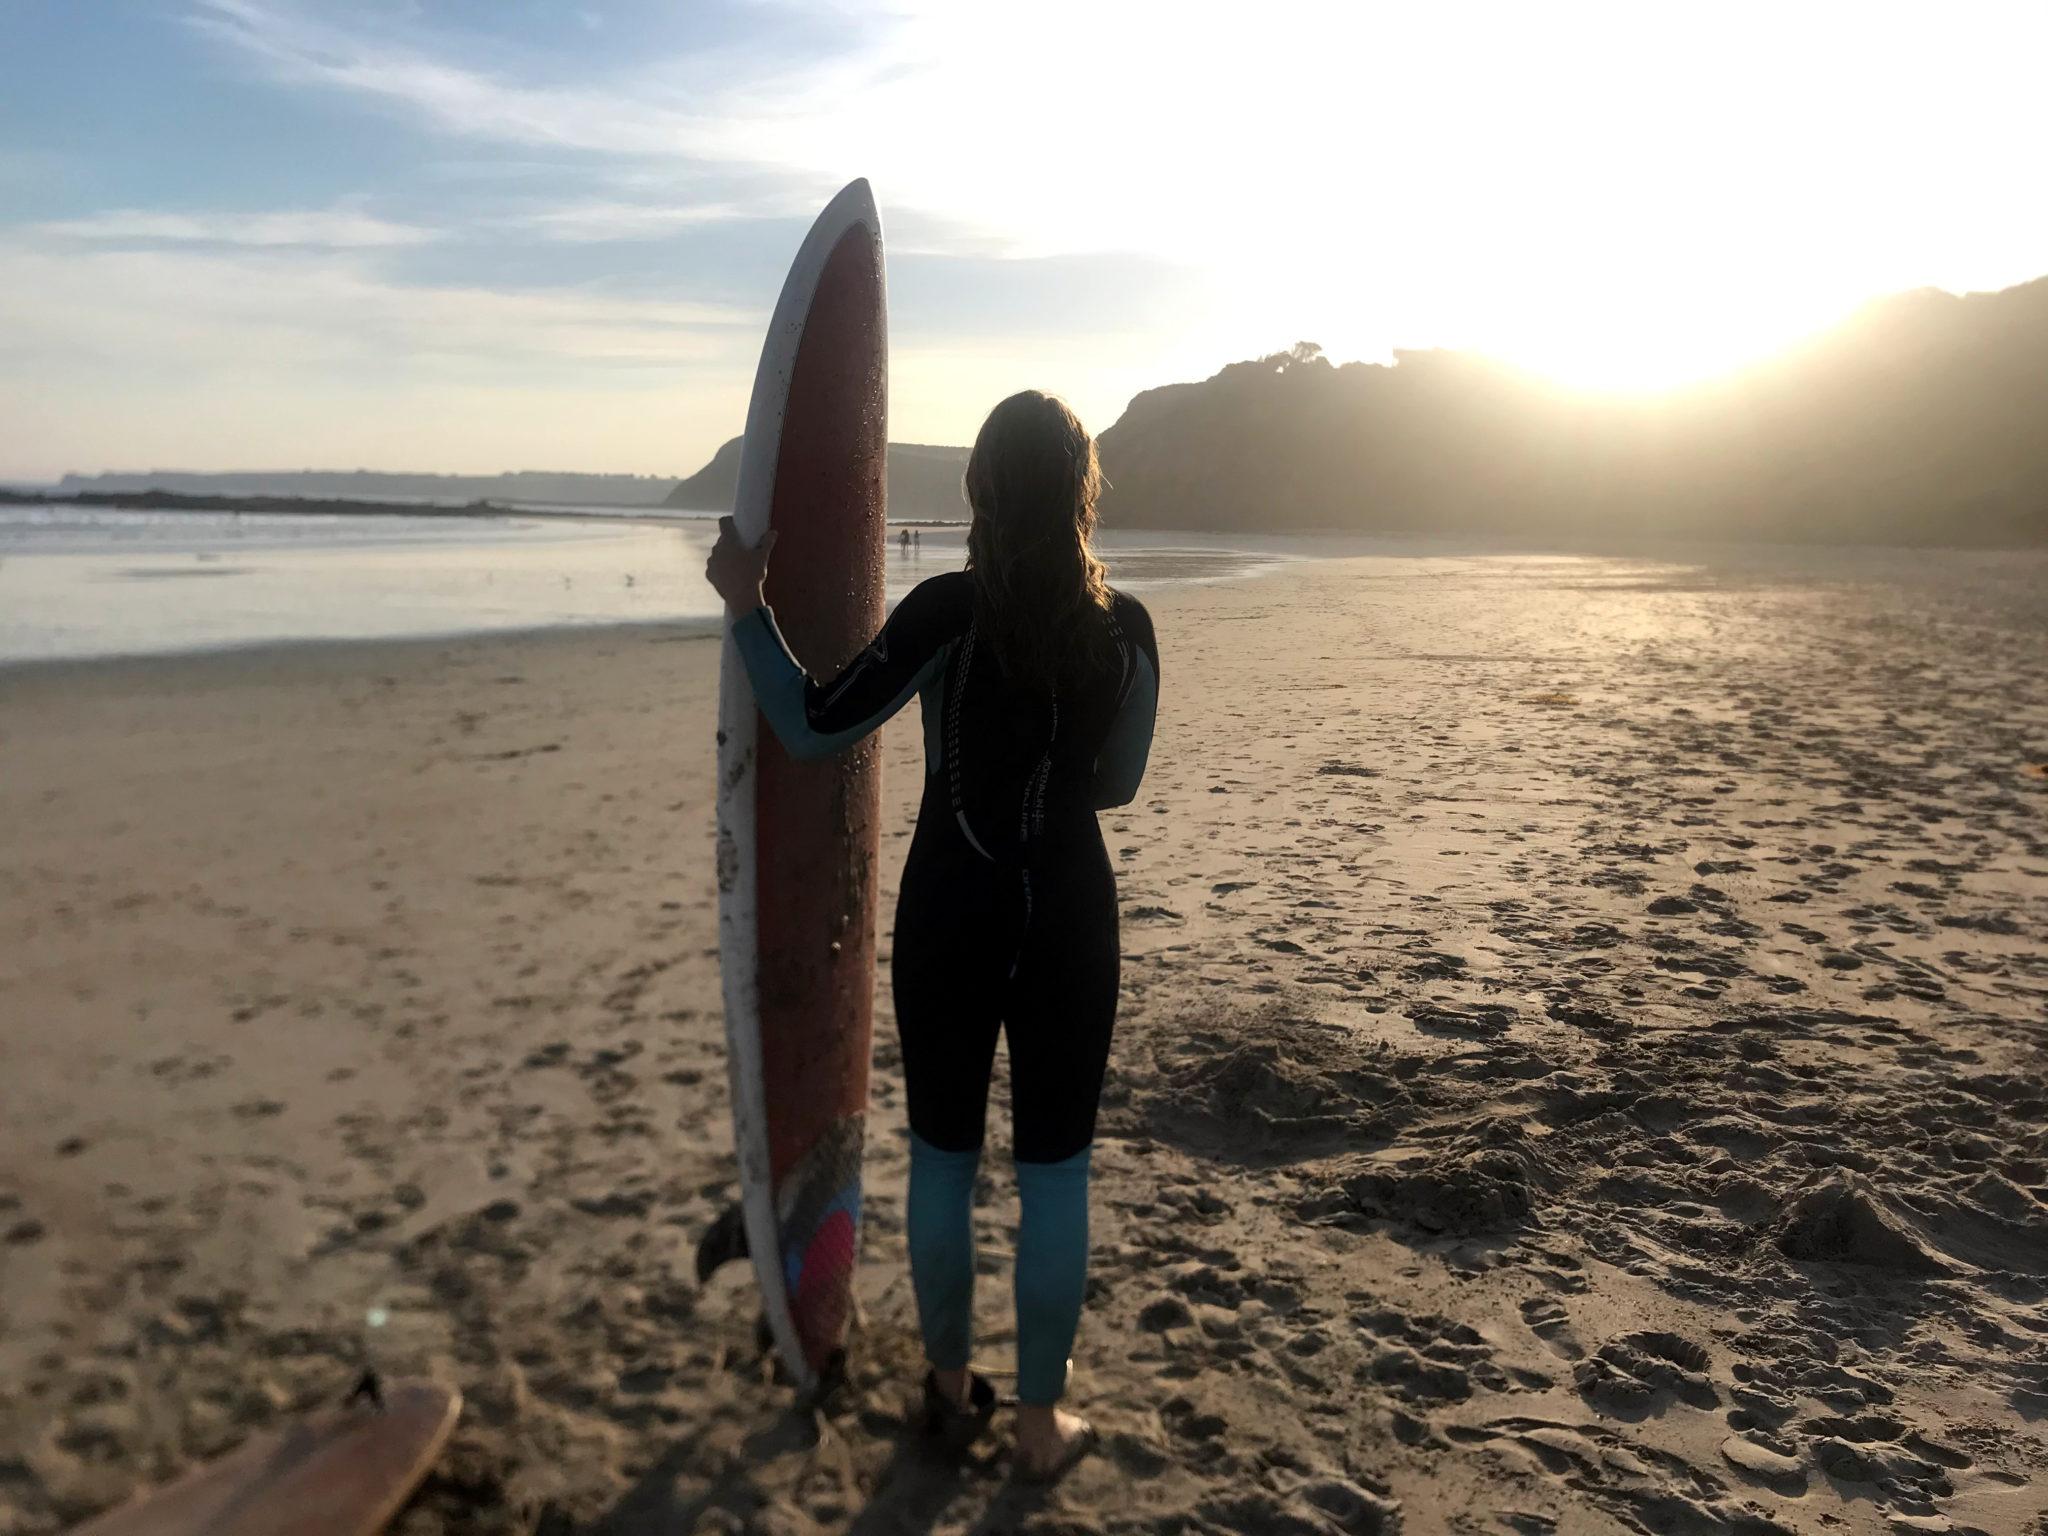 Mona mit Surfboard